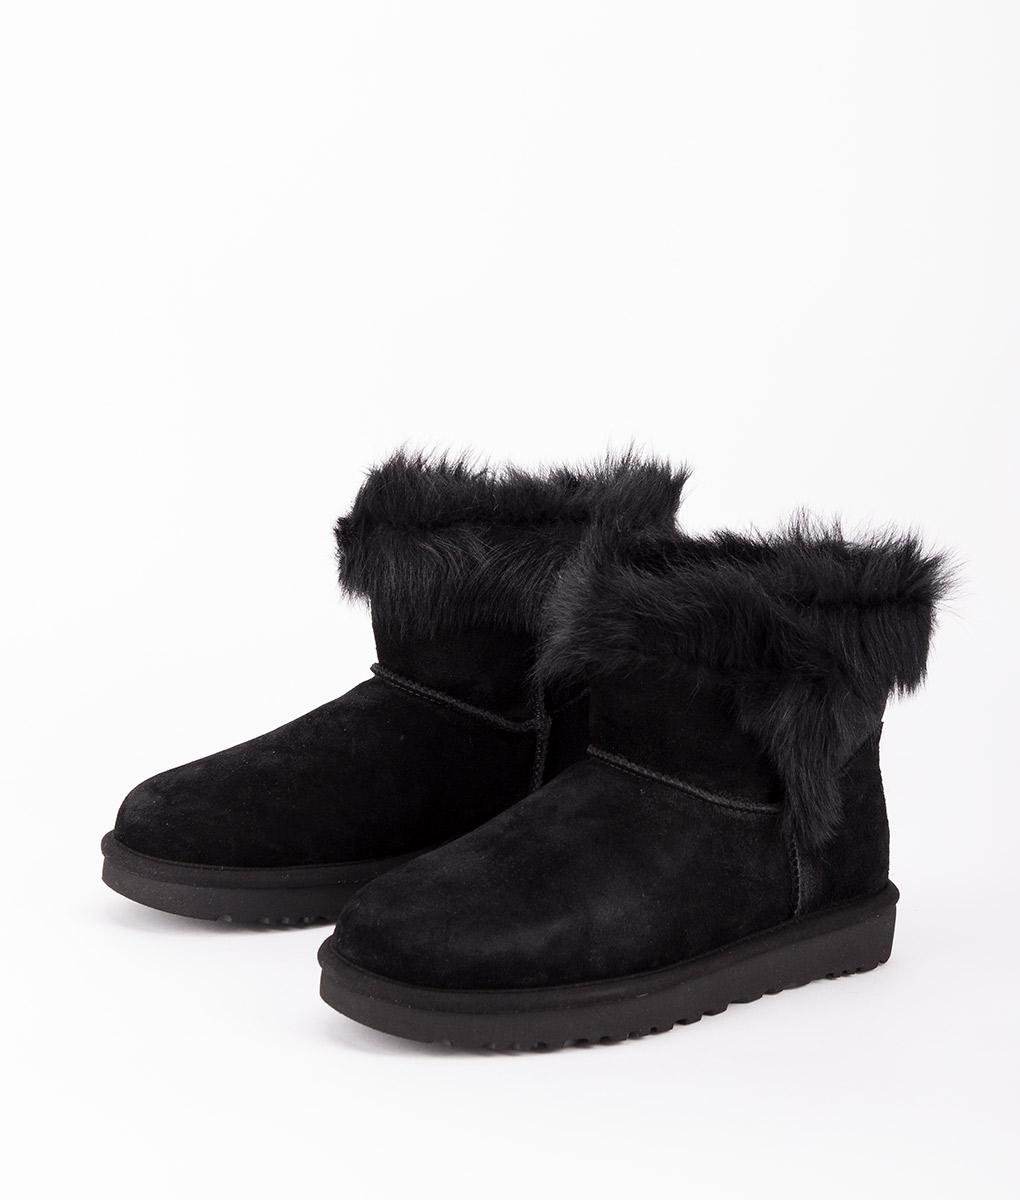 UGG Women Ankle Boots 1018303 MILA, Black 269.99 2